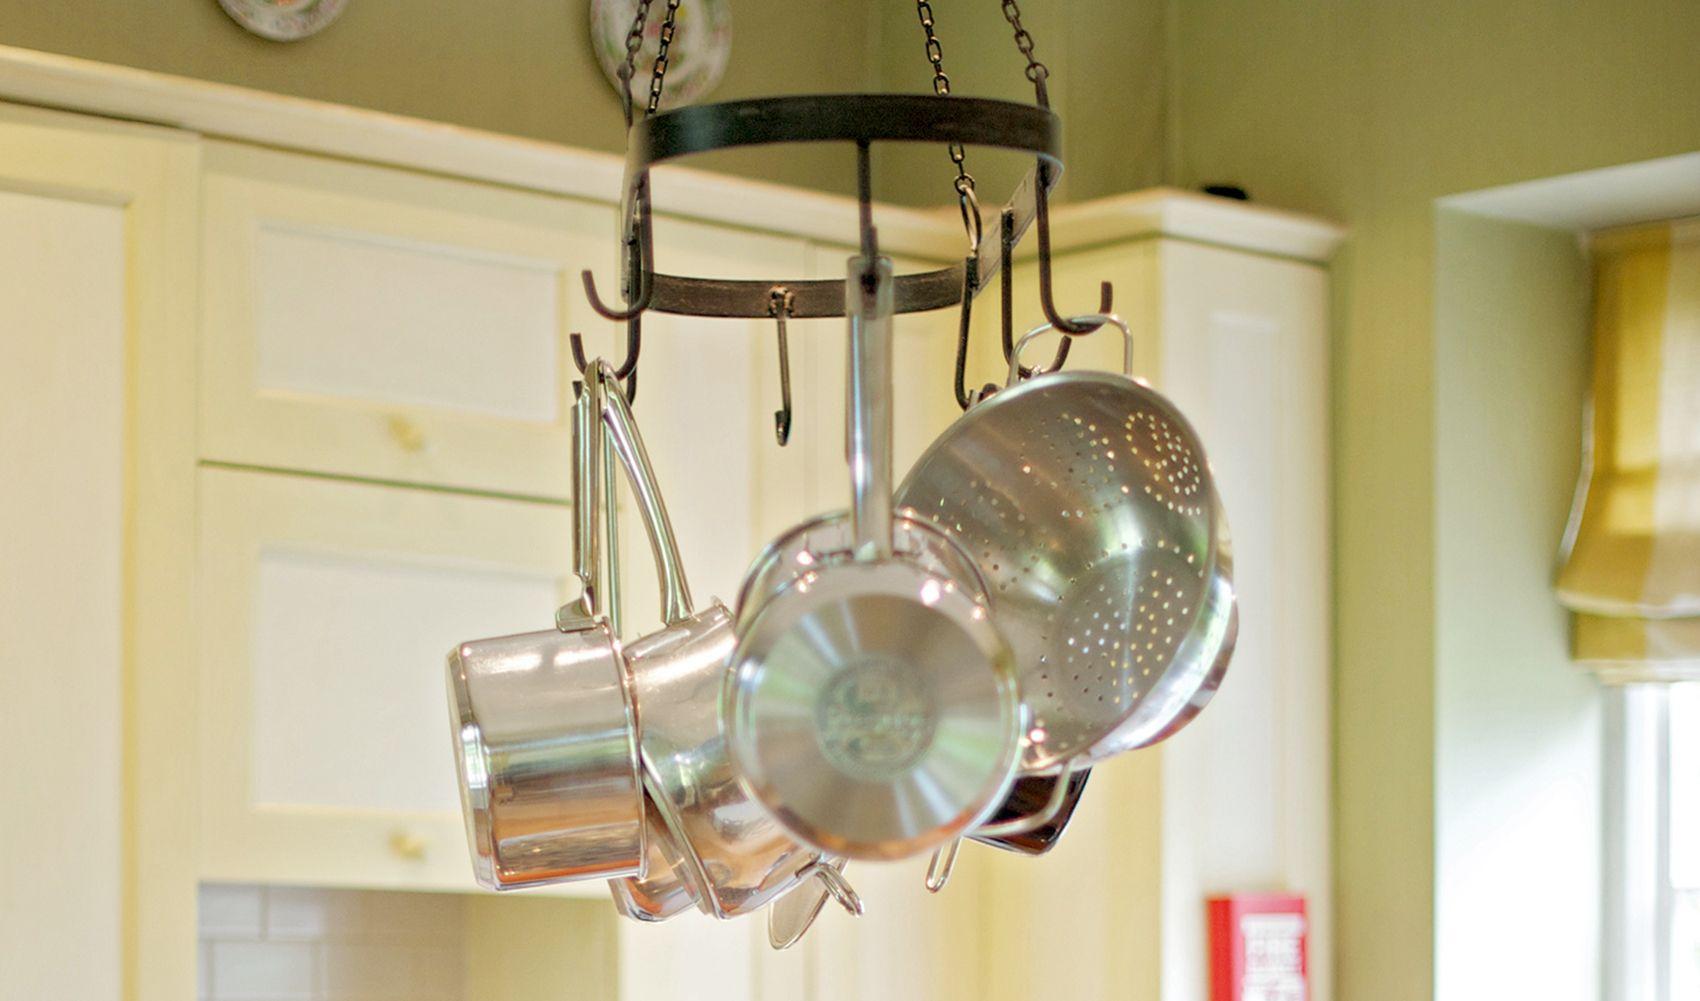 Ground floor: Wrought iron rack for saucepans and utensils above kitchen island